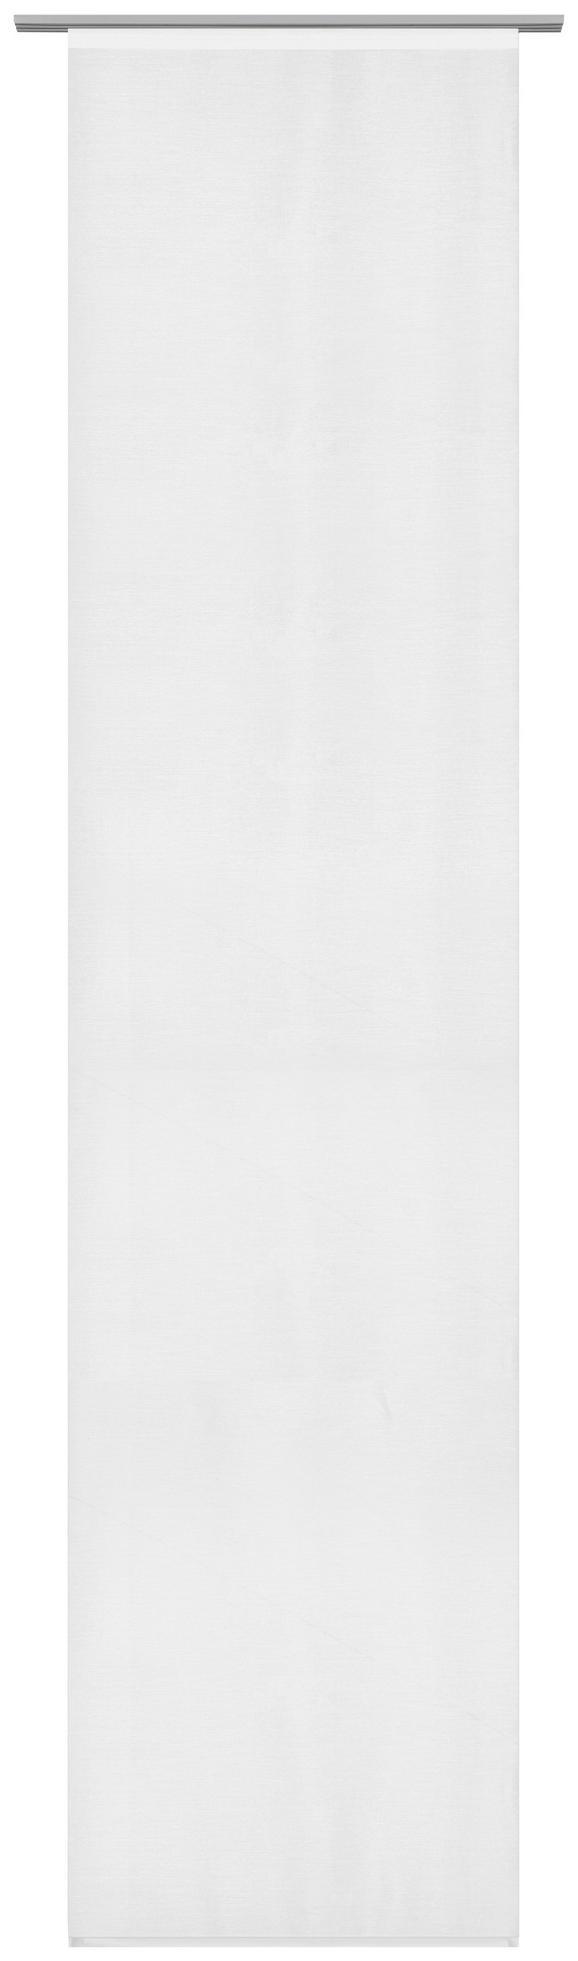 Panelna Zavesa Uni - bela, Moderno, tekstil (60/245cm) - Mömax modern living